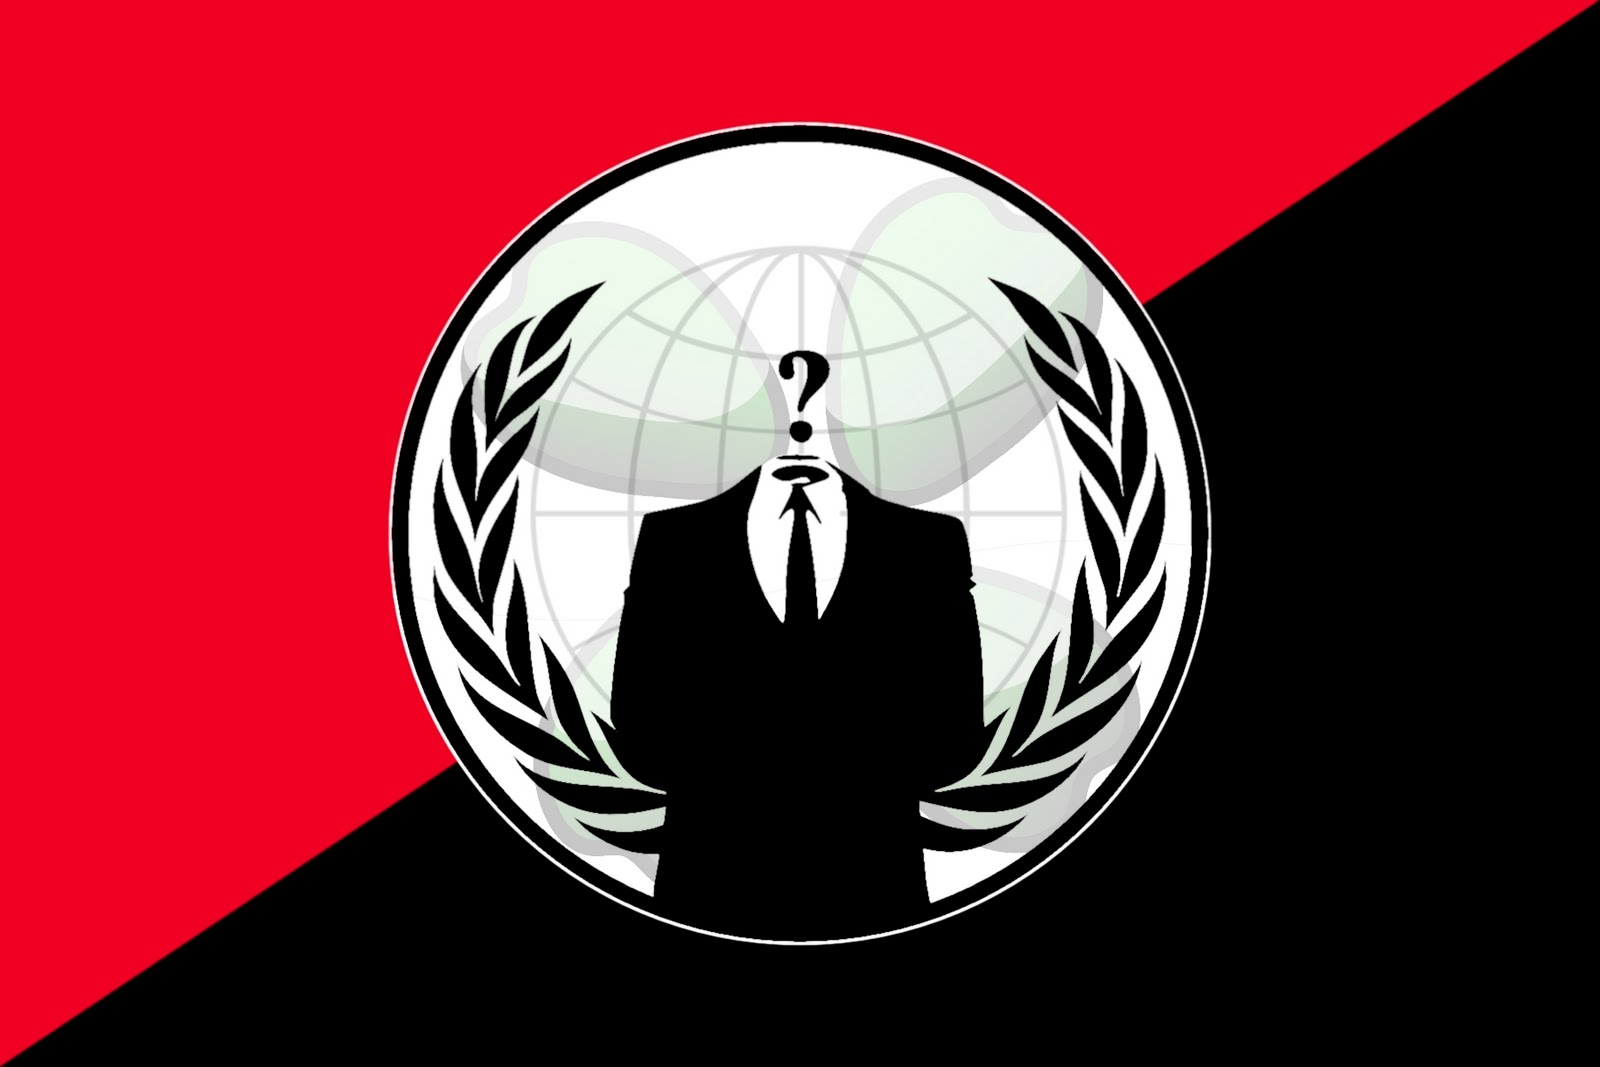 anonymouscatala